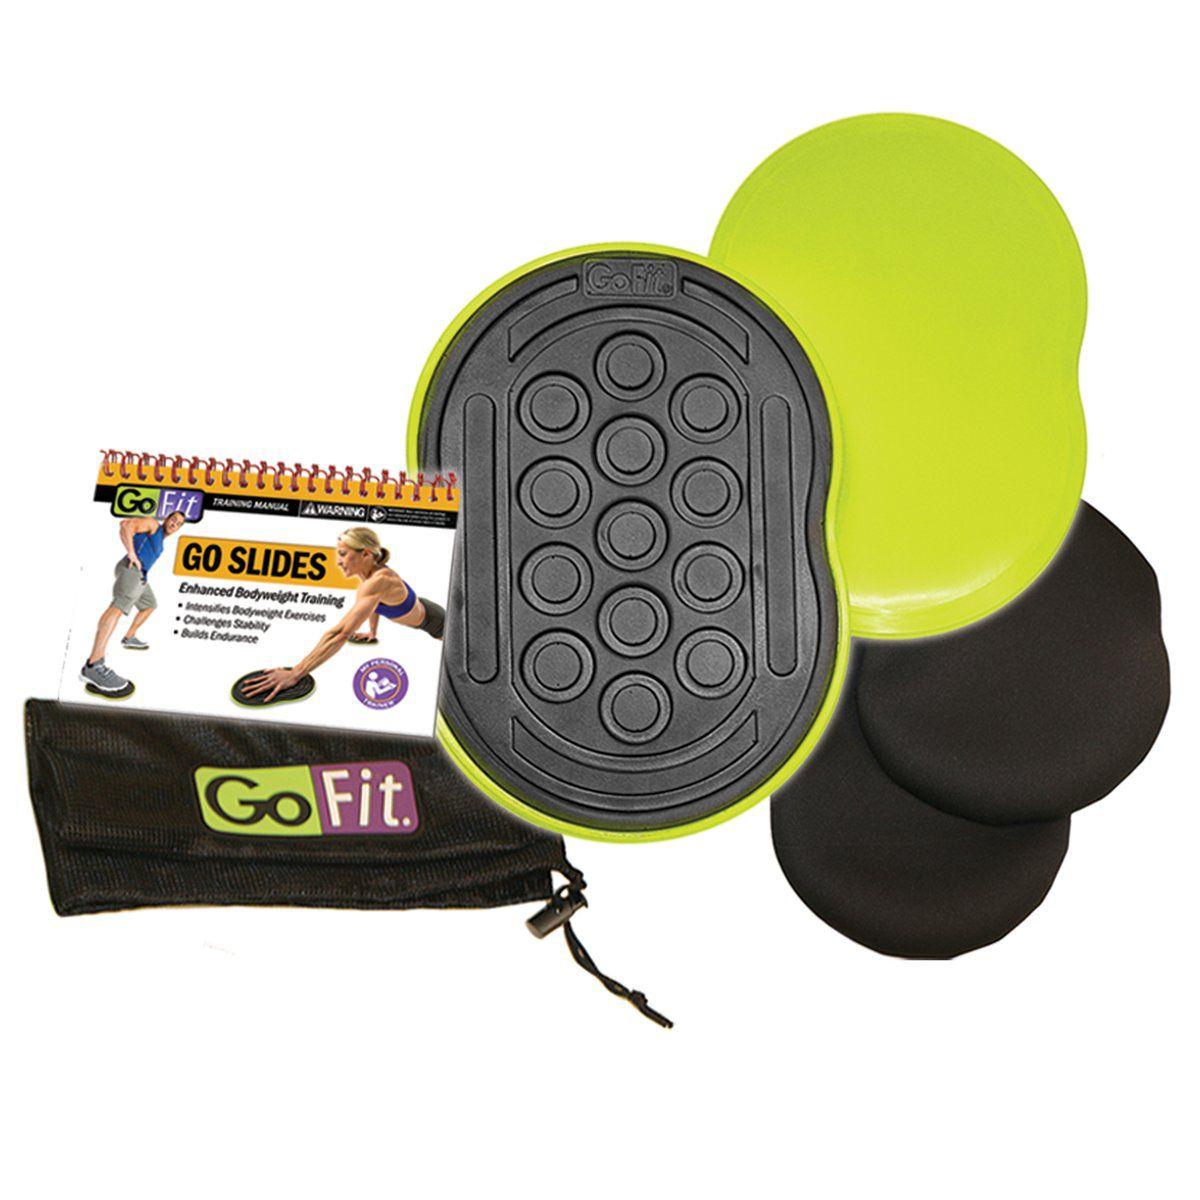 GoFit Go Sliders